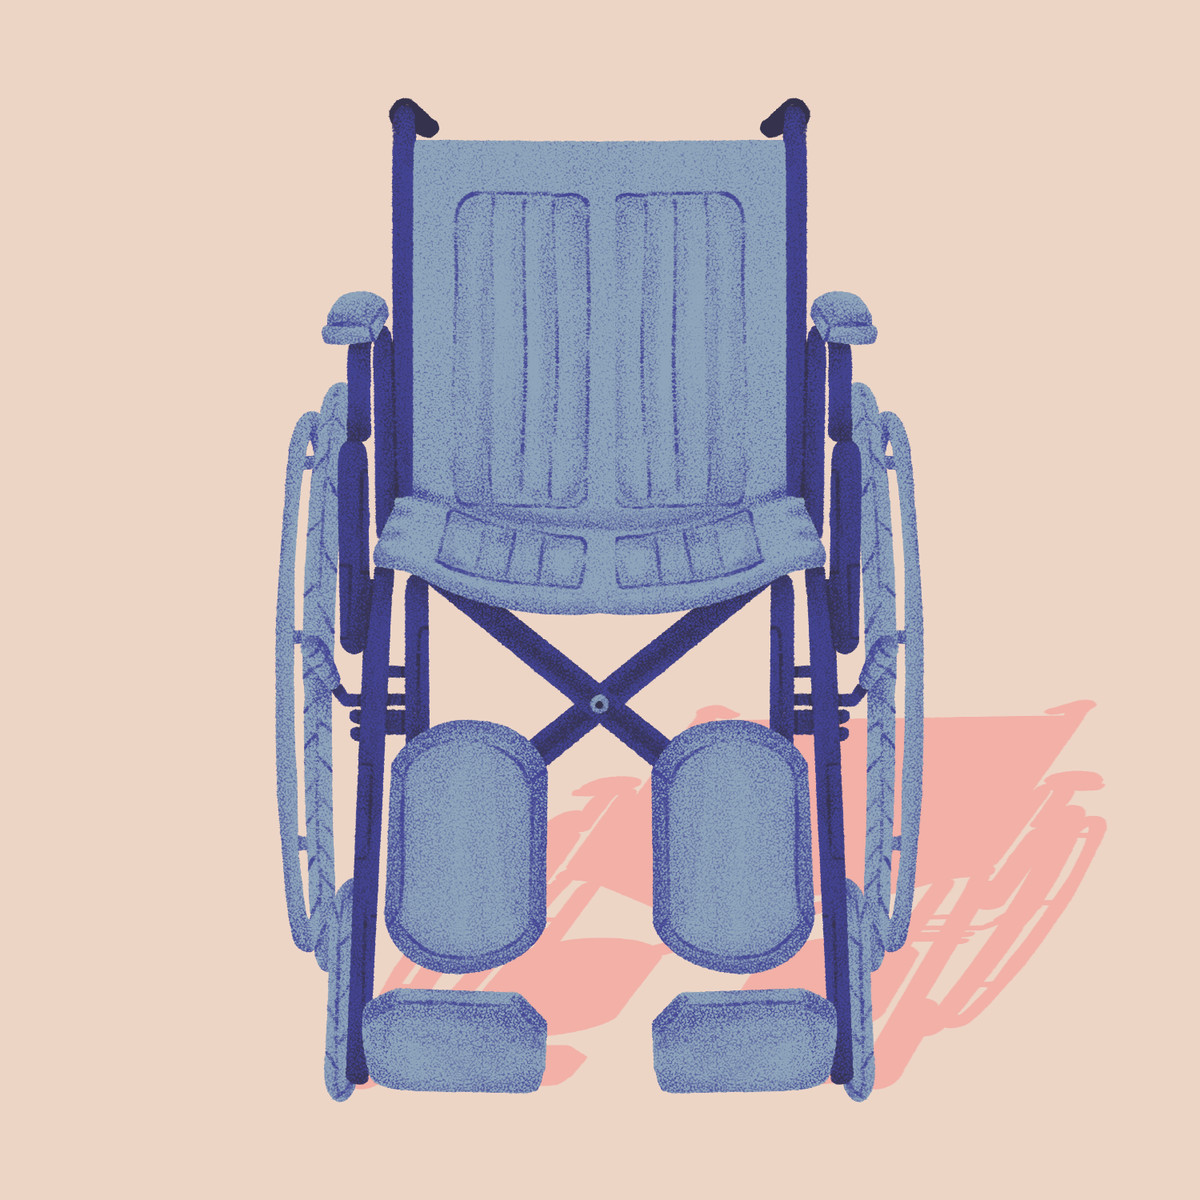 An empty wheelchair